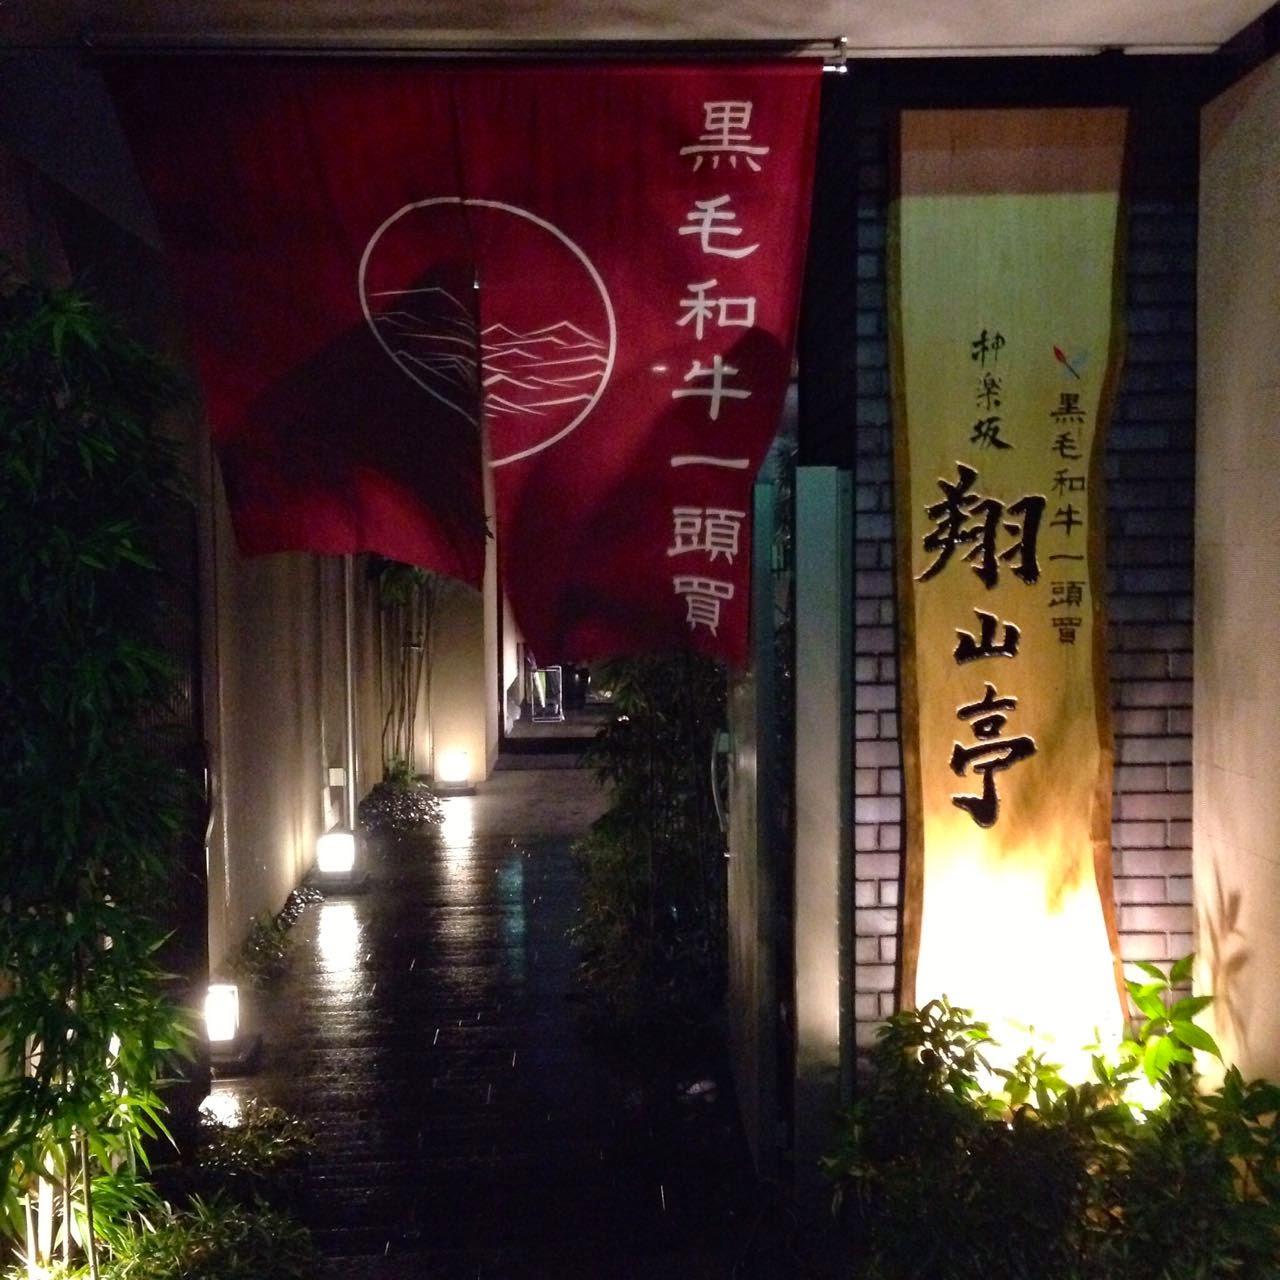 Kagurazaka Shōzantei 神楽坂 翔山亭